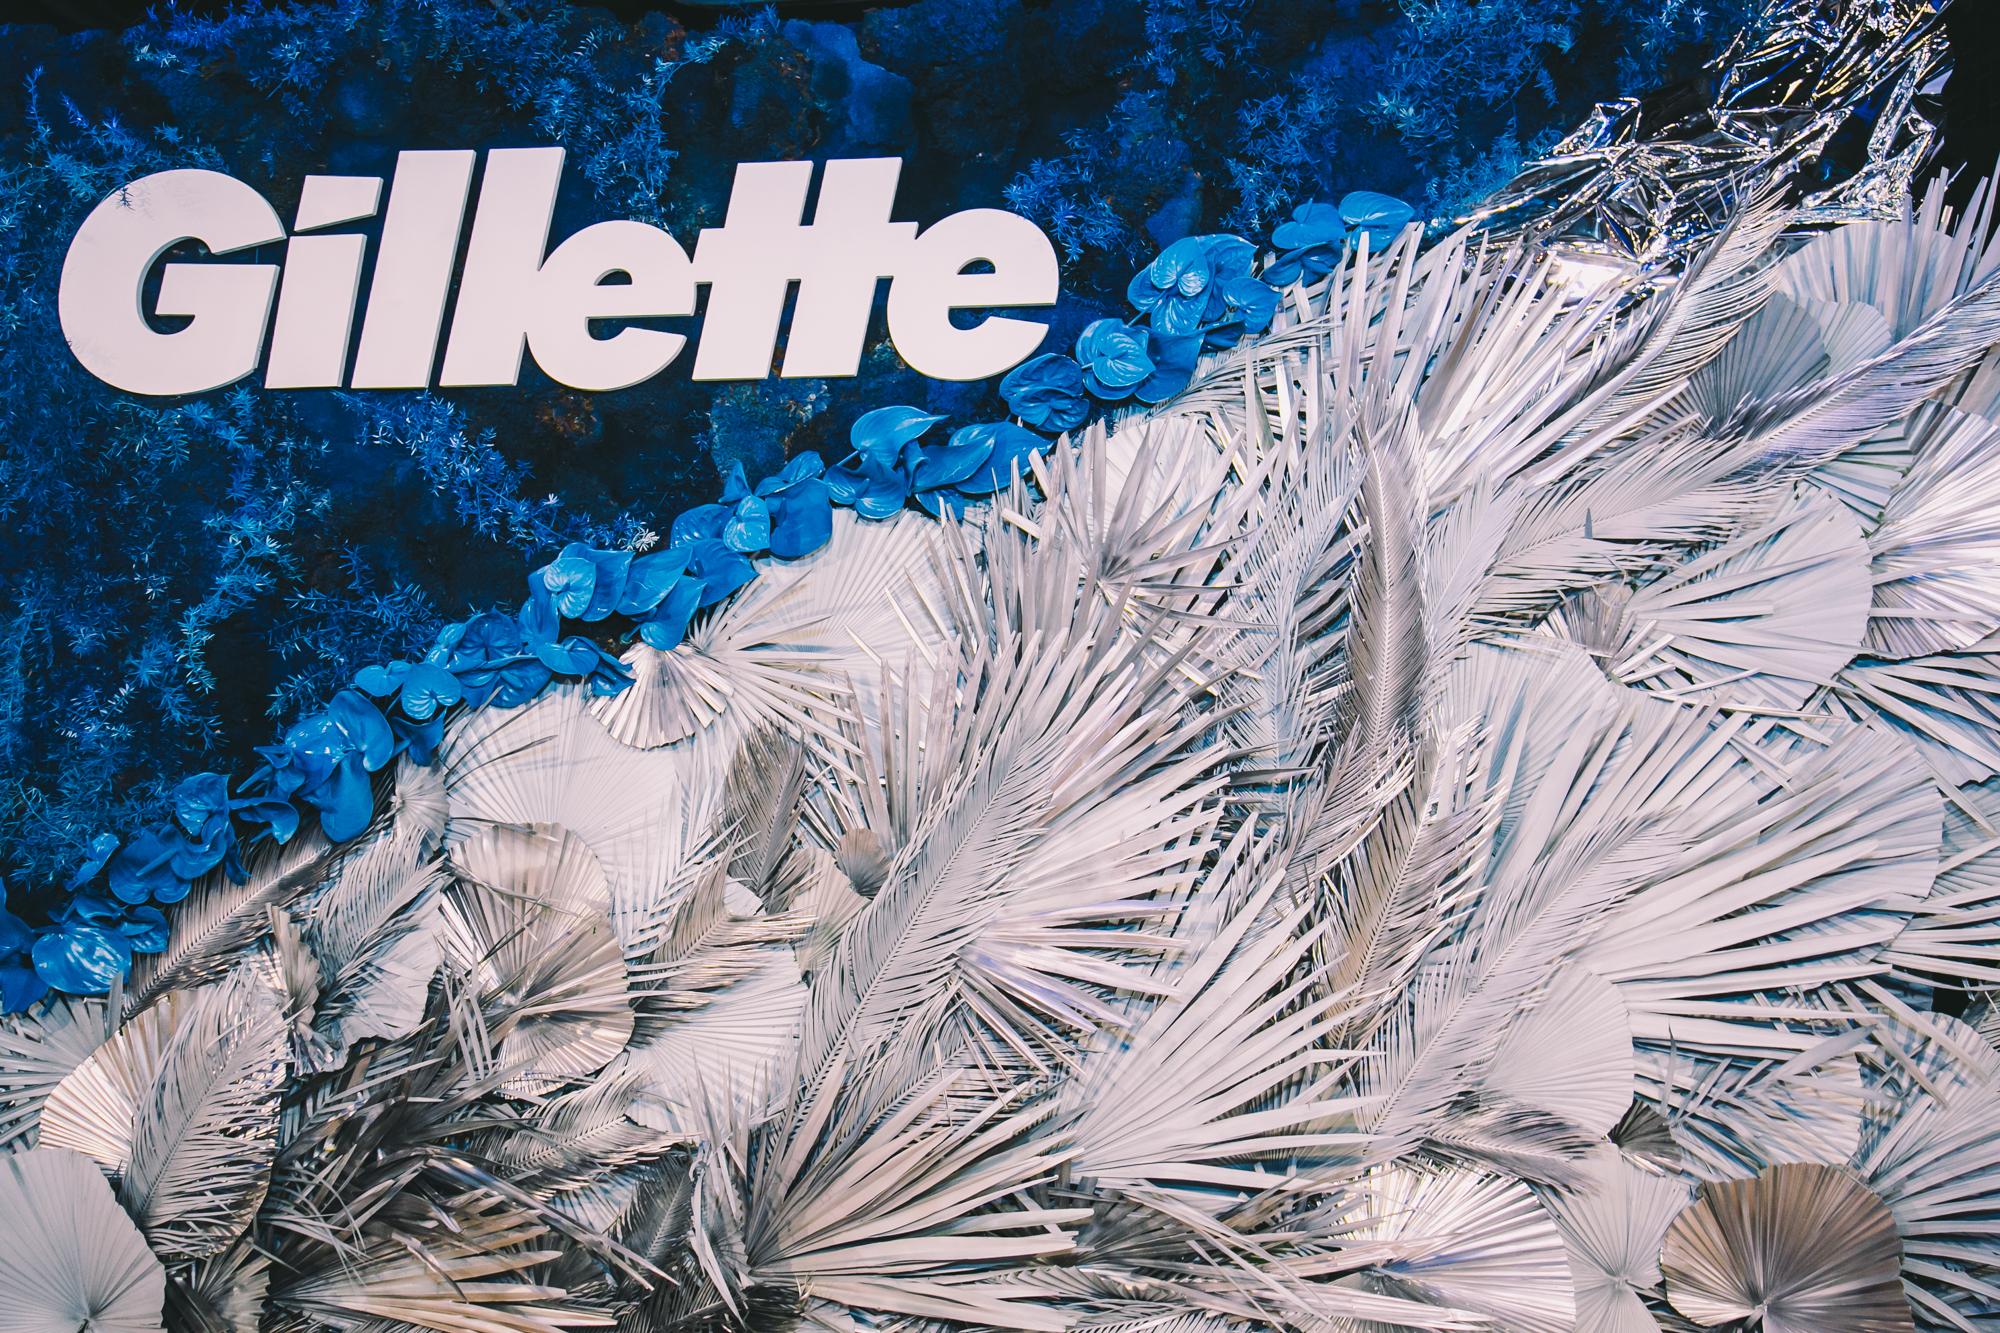 C3 Agency_Gillette_ERC Wall Selects1 (1).jpg